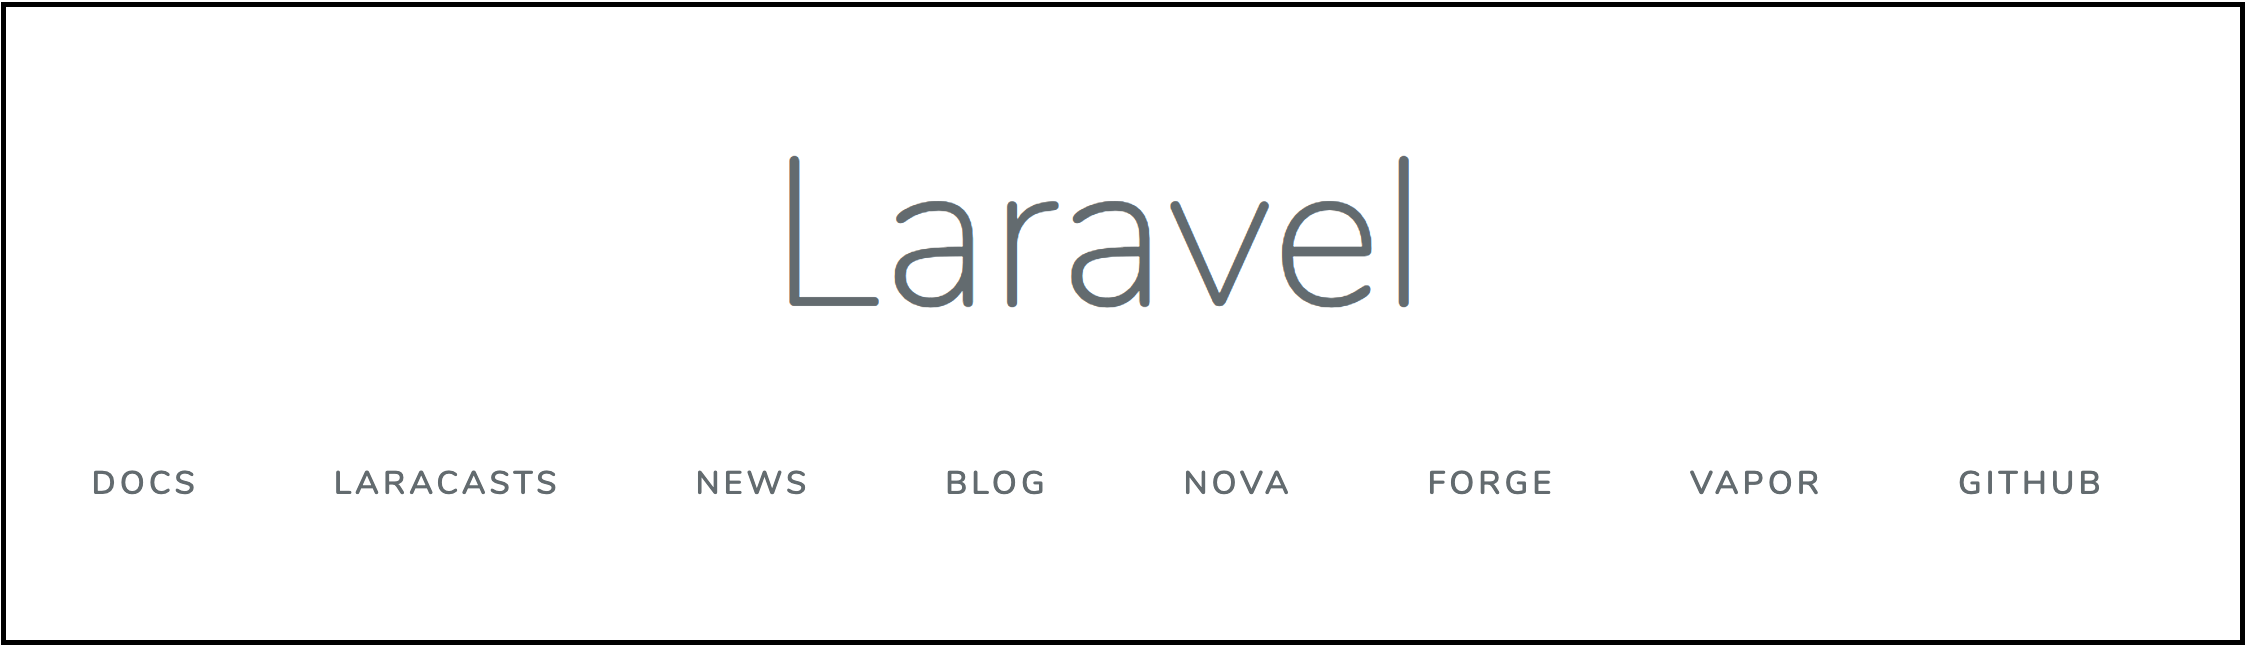 Title-Laravel